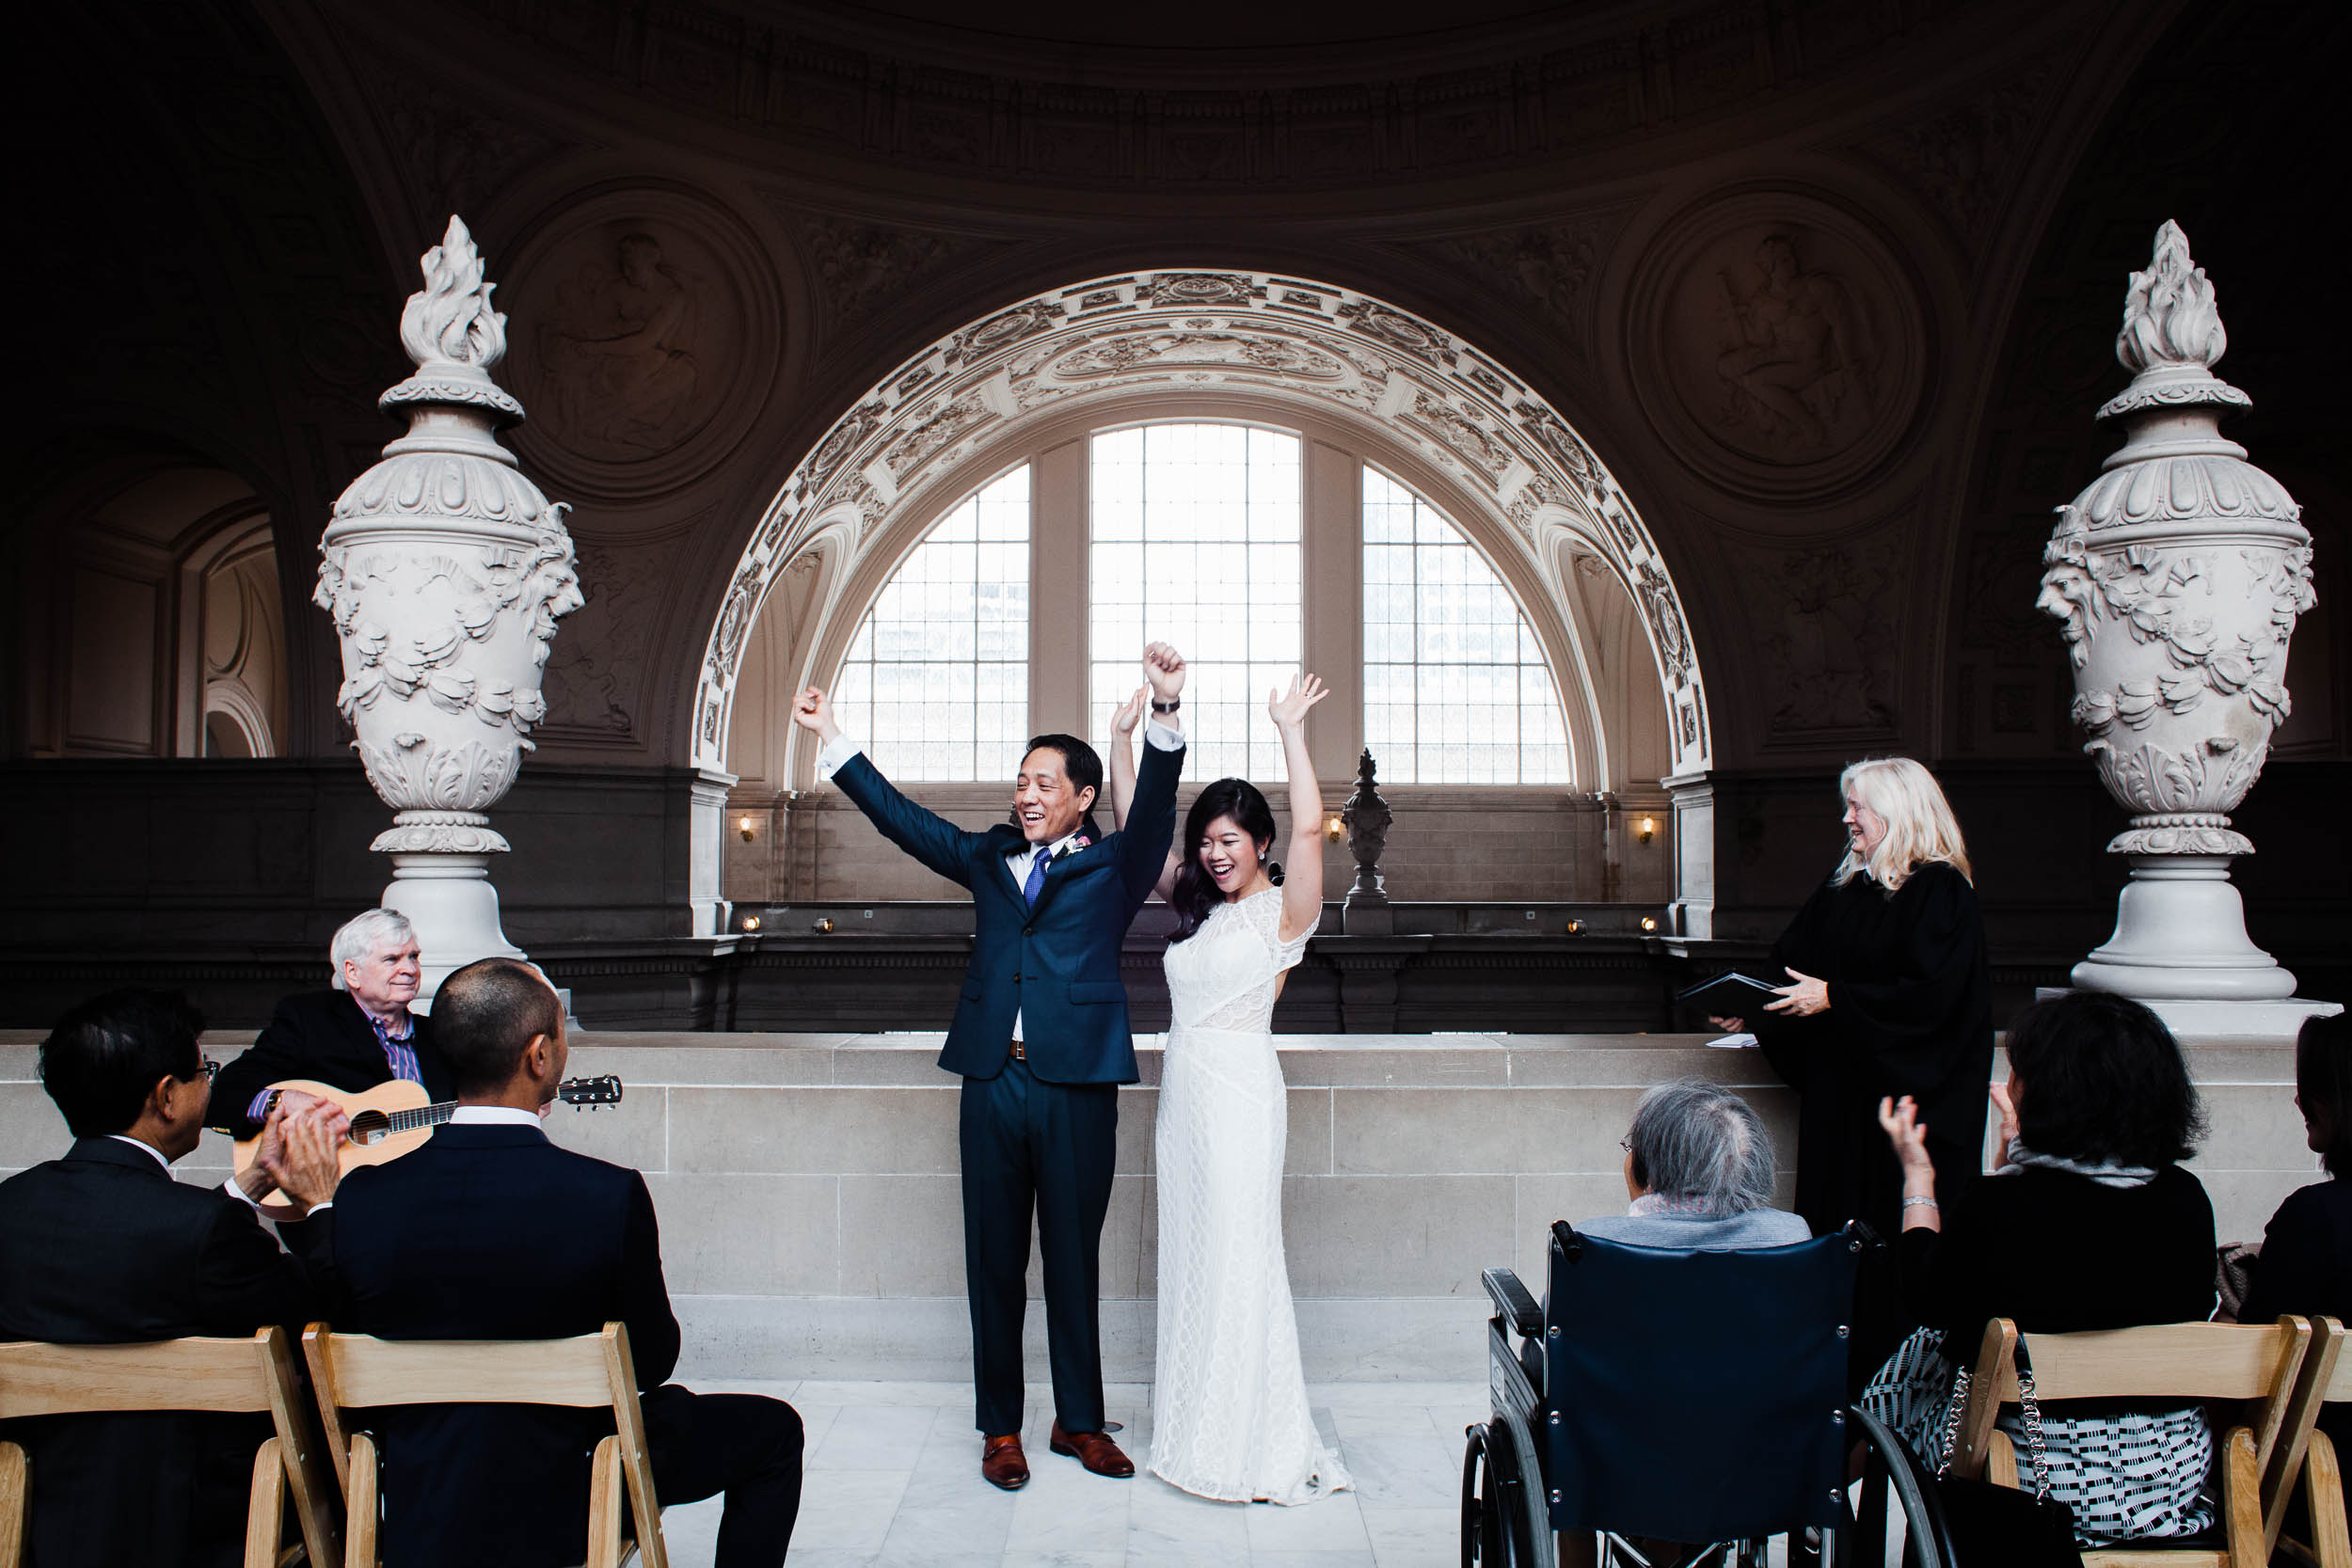 032118_M+D City Hall Wedding_Buena Lane Photography_0690.jpg